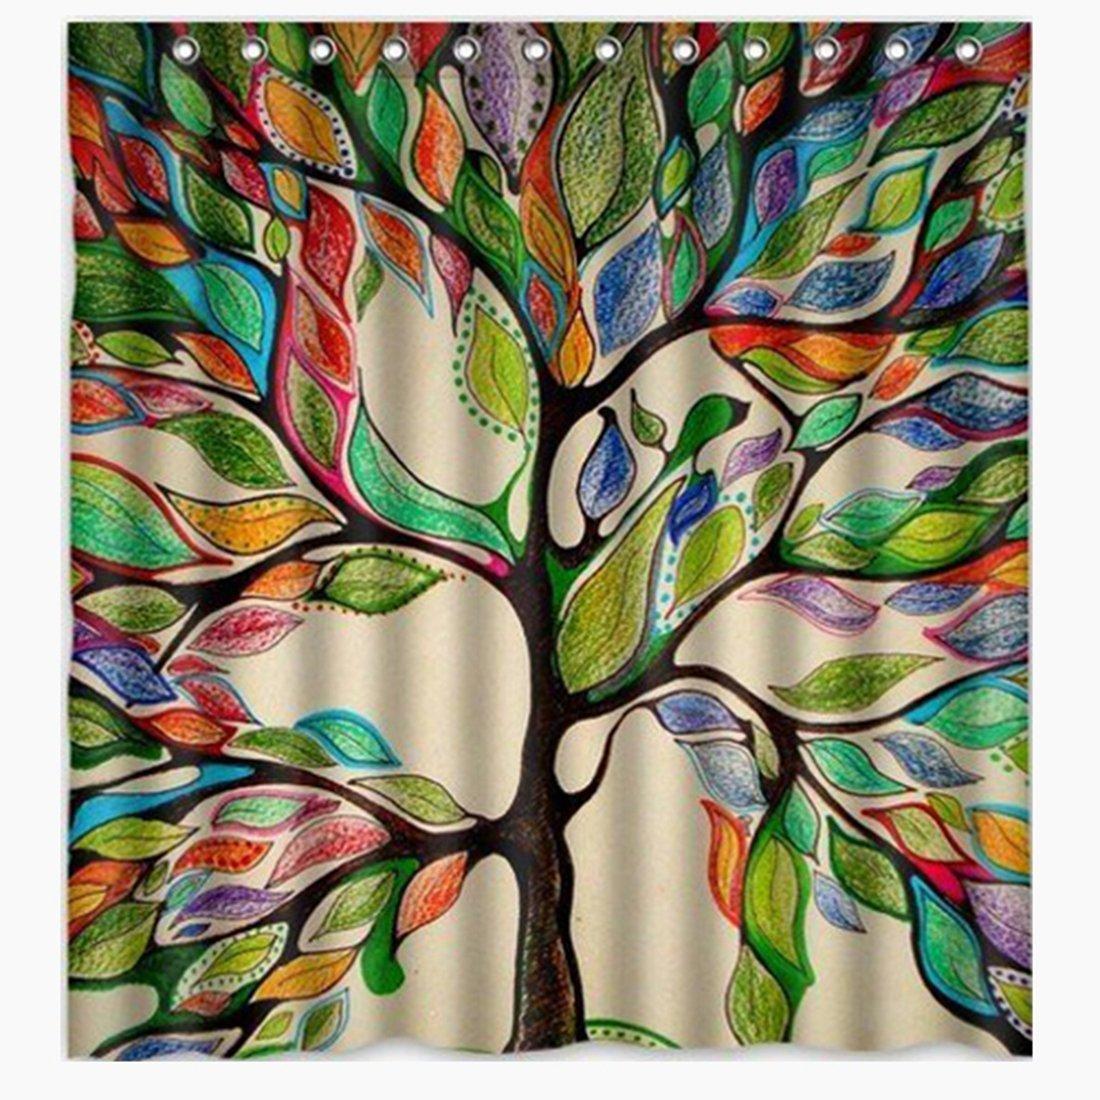 Bath Shower Curtain-Colorful Tree of Life Gorgeous Like Feather Bathroom Shower Curtain - Custom Polyester Fabric kids Decorative Curtain Ideas (72''W x 72''H) (72''W x 72''H, Colorful Tree of Life)